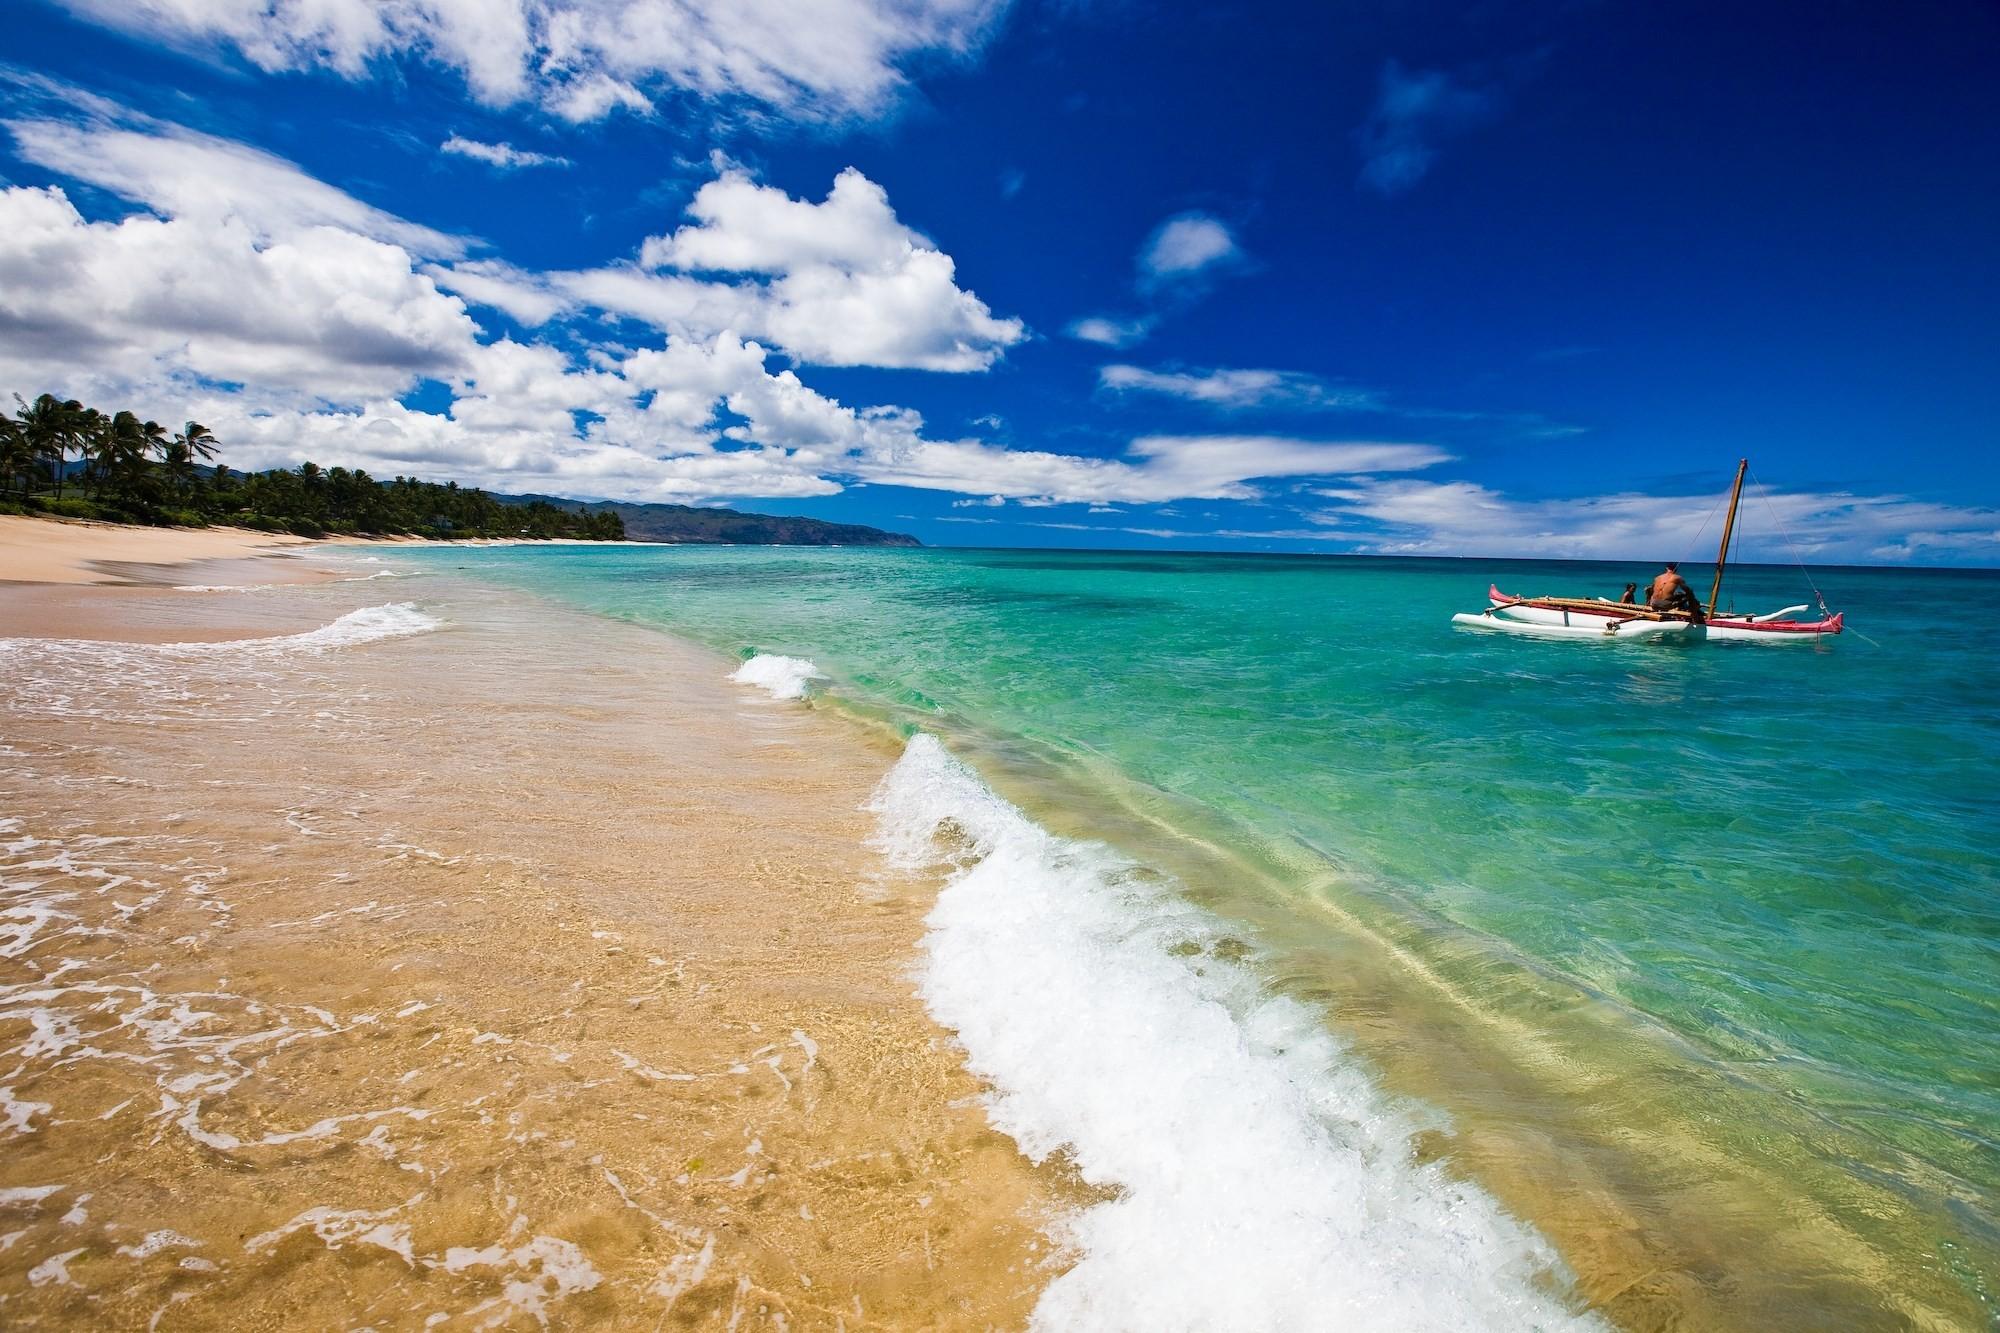 hawaii desktop wallpaper hd wallpapers